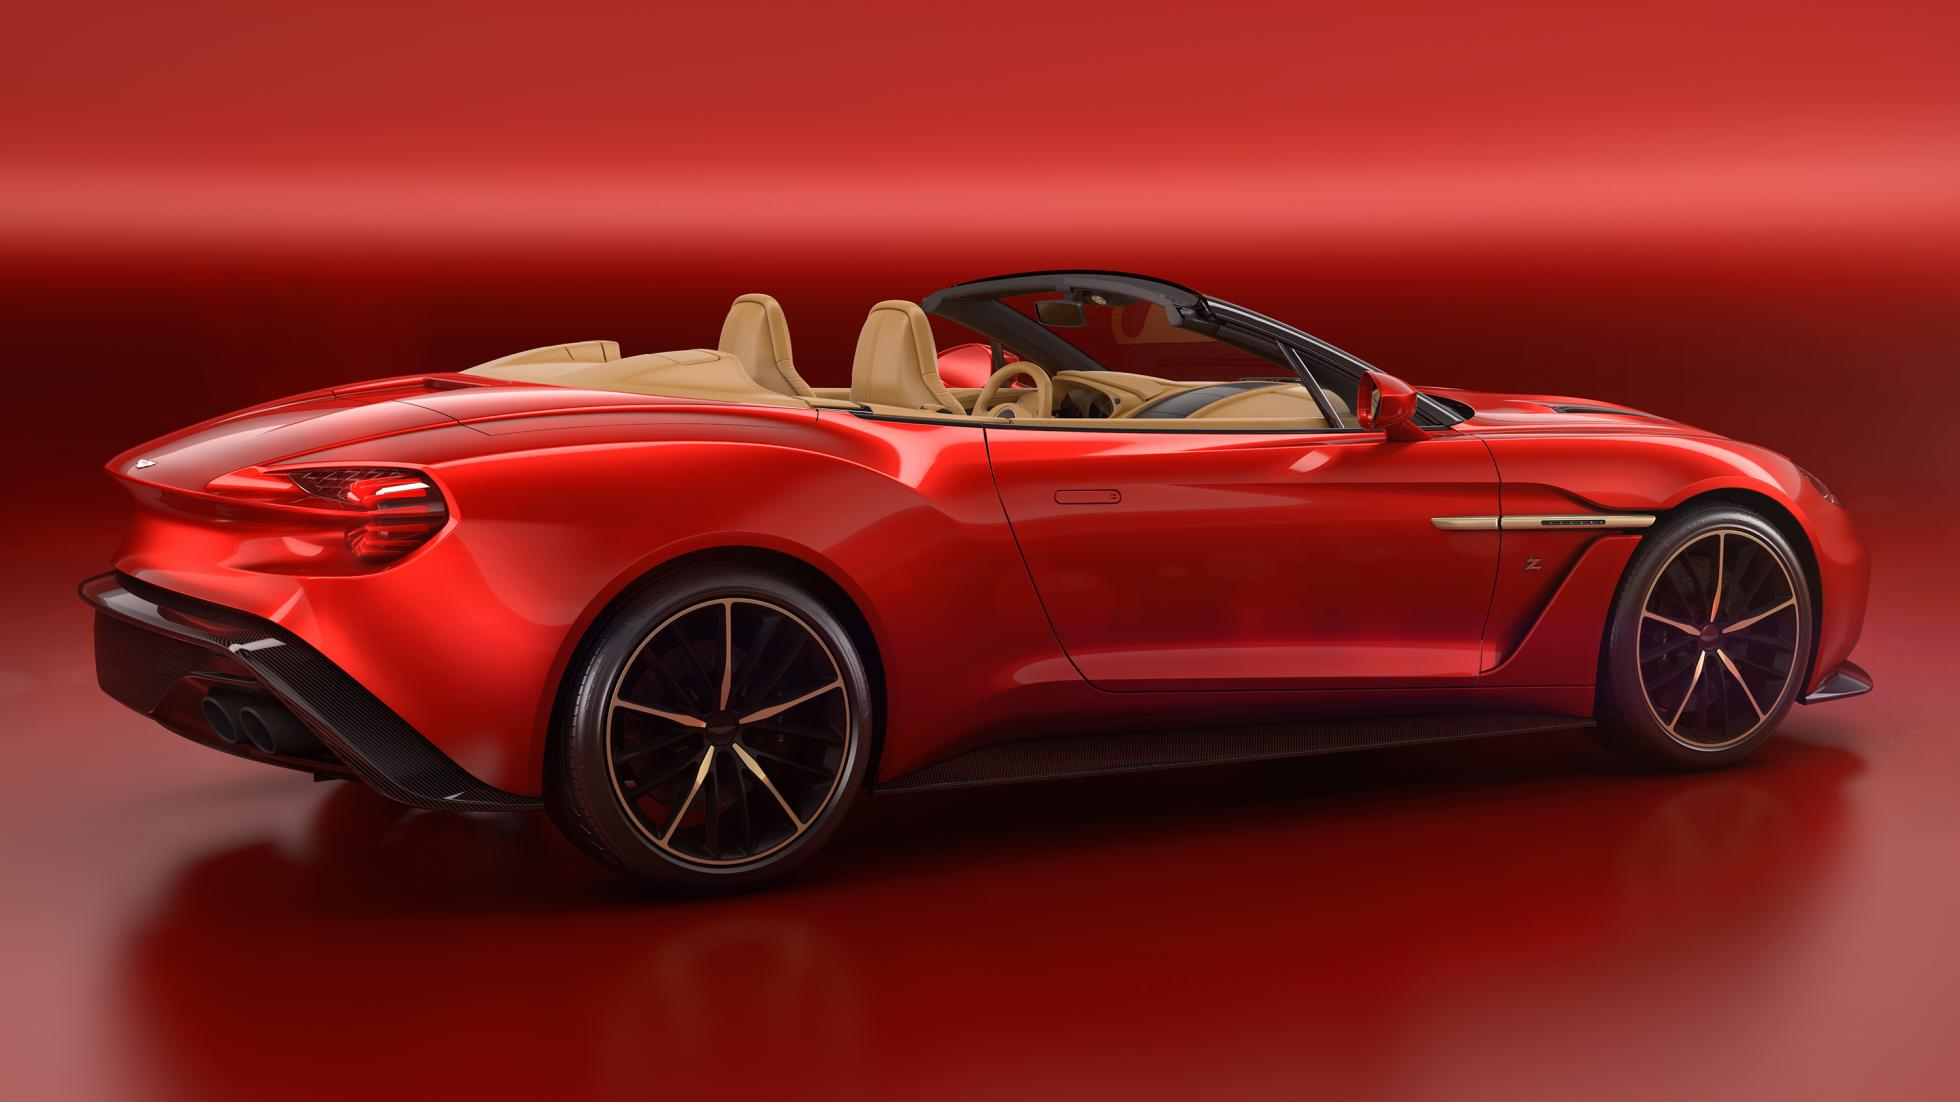 Vanquish Zagato Volante © Aston Martin Lagonda Limited